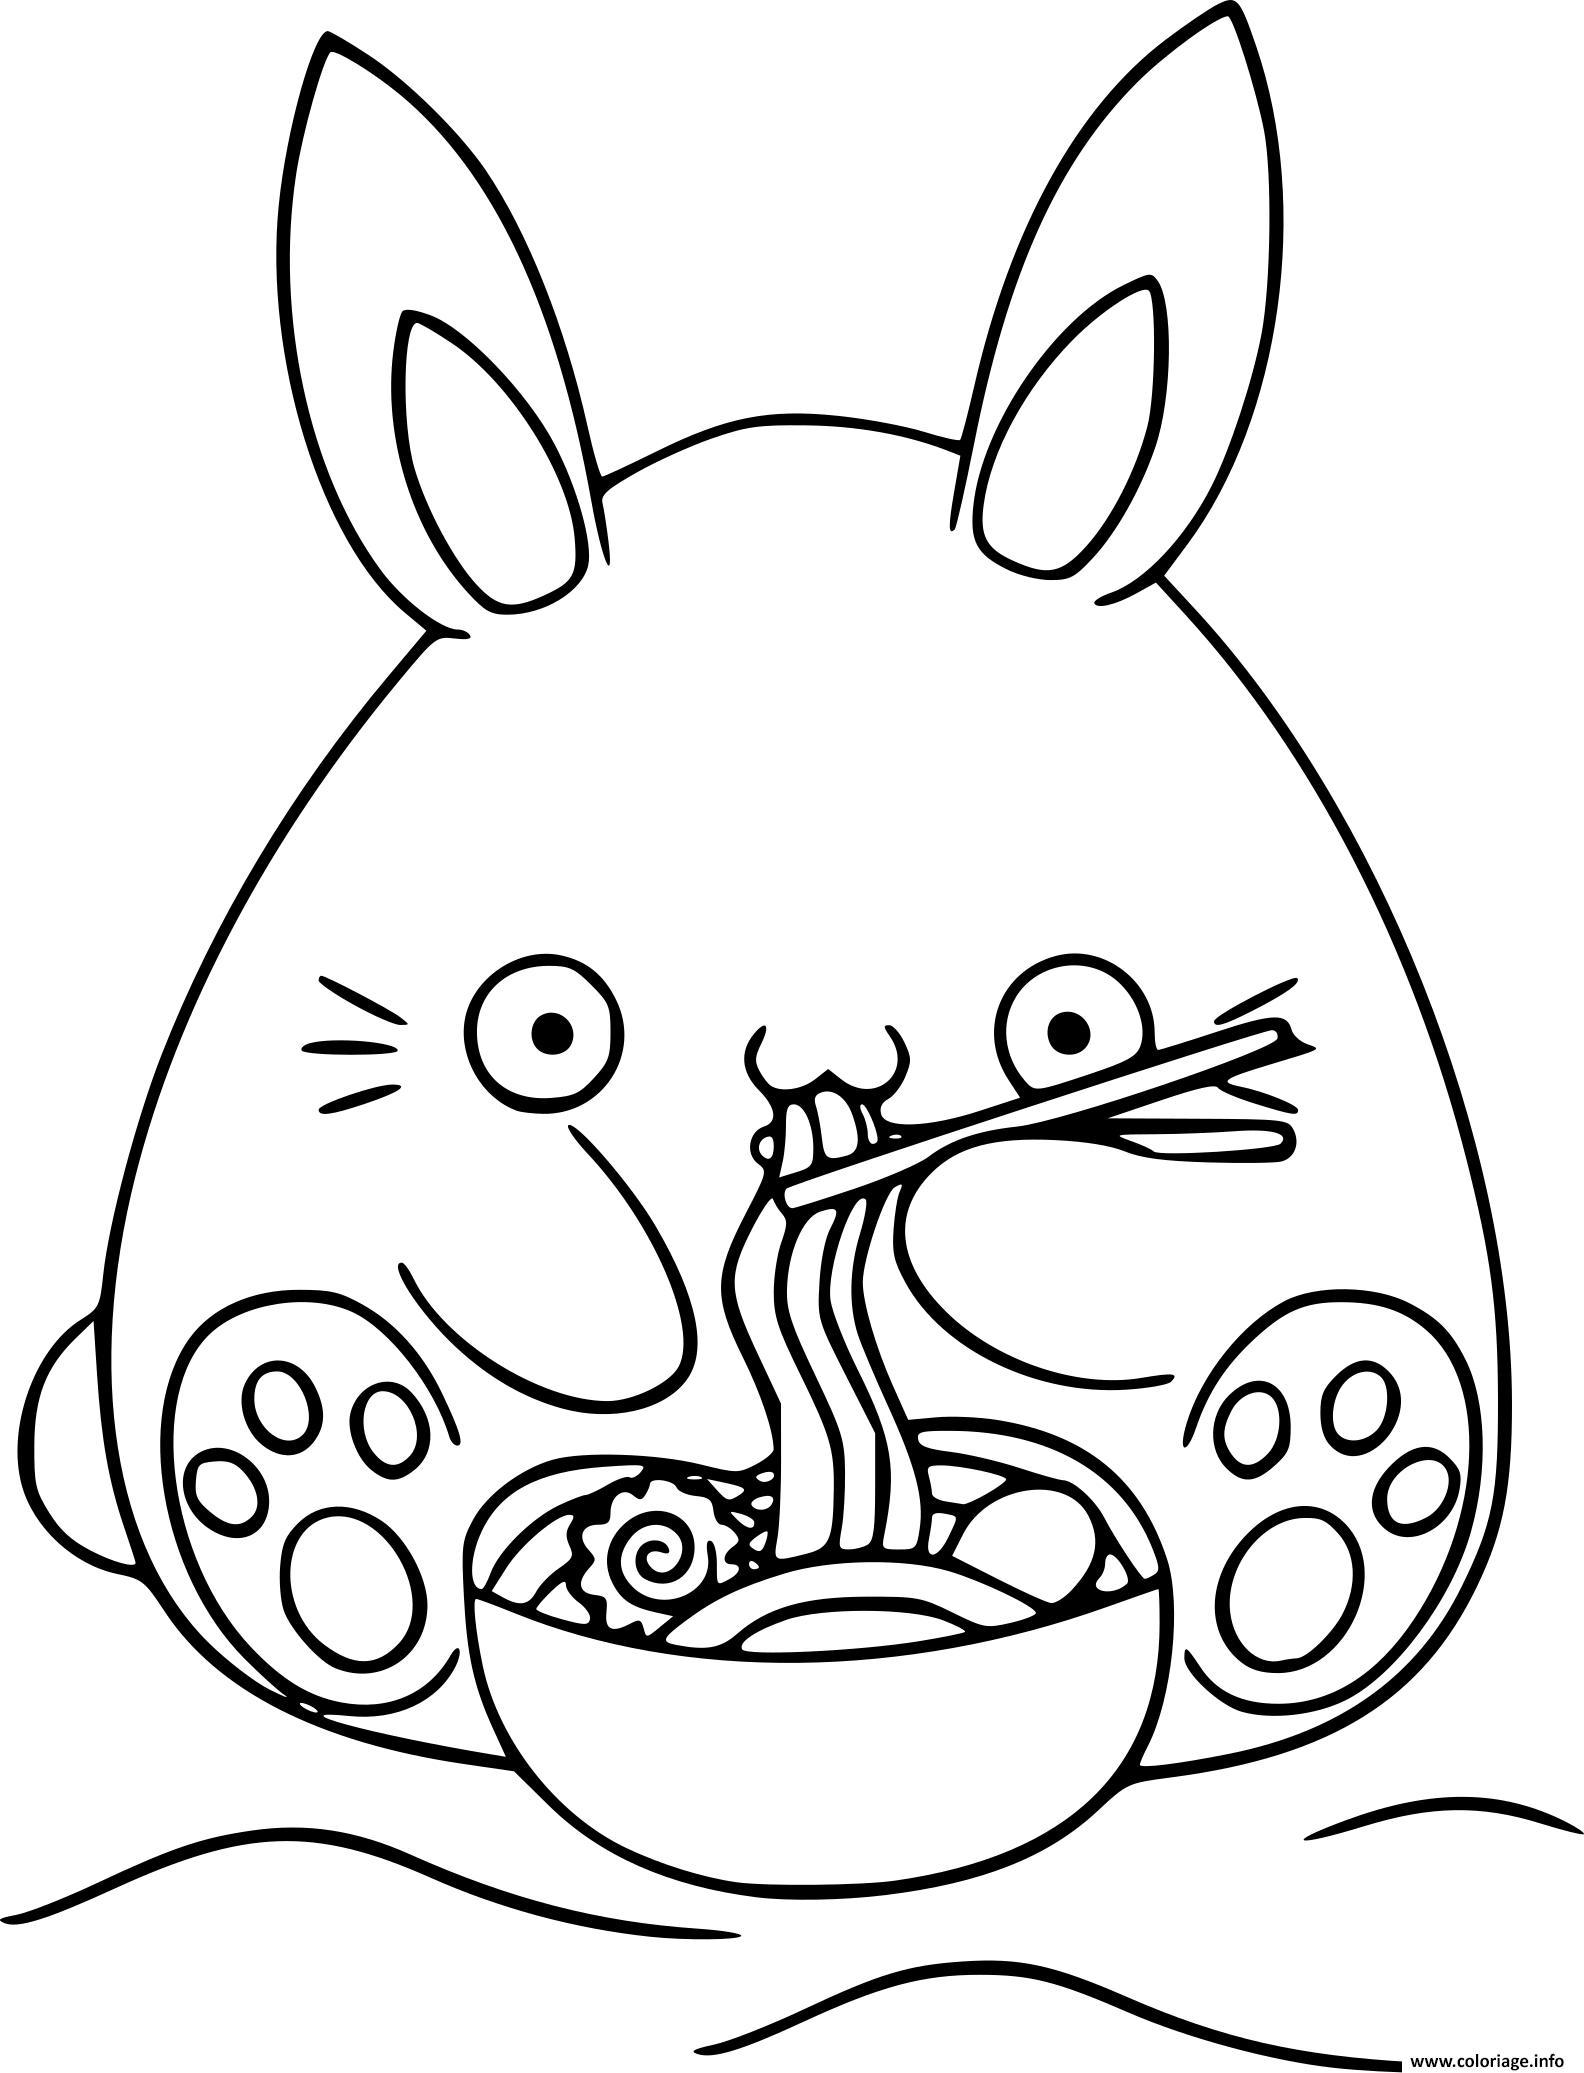 Dessin dessin lapin kawaii Coloriage Gratuit à Imprimer